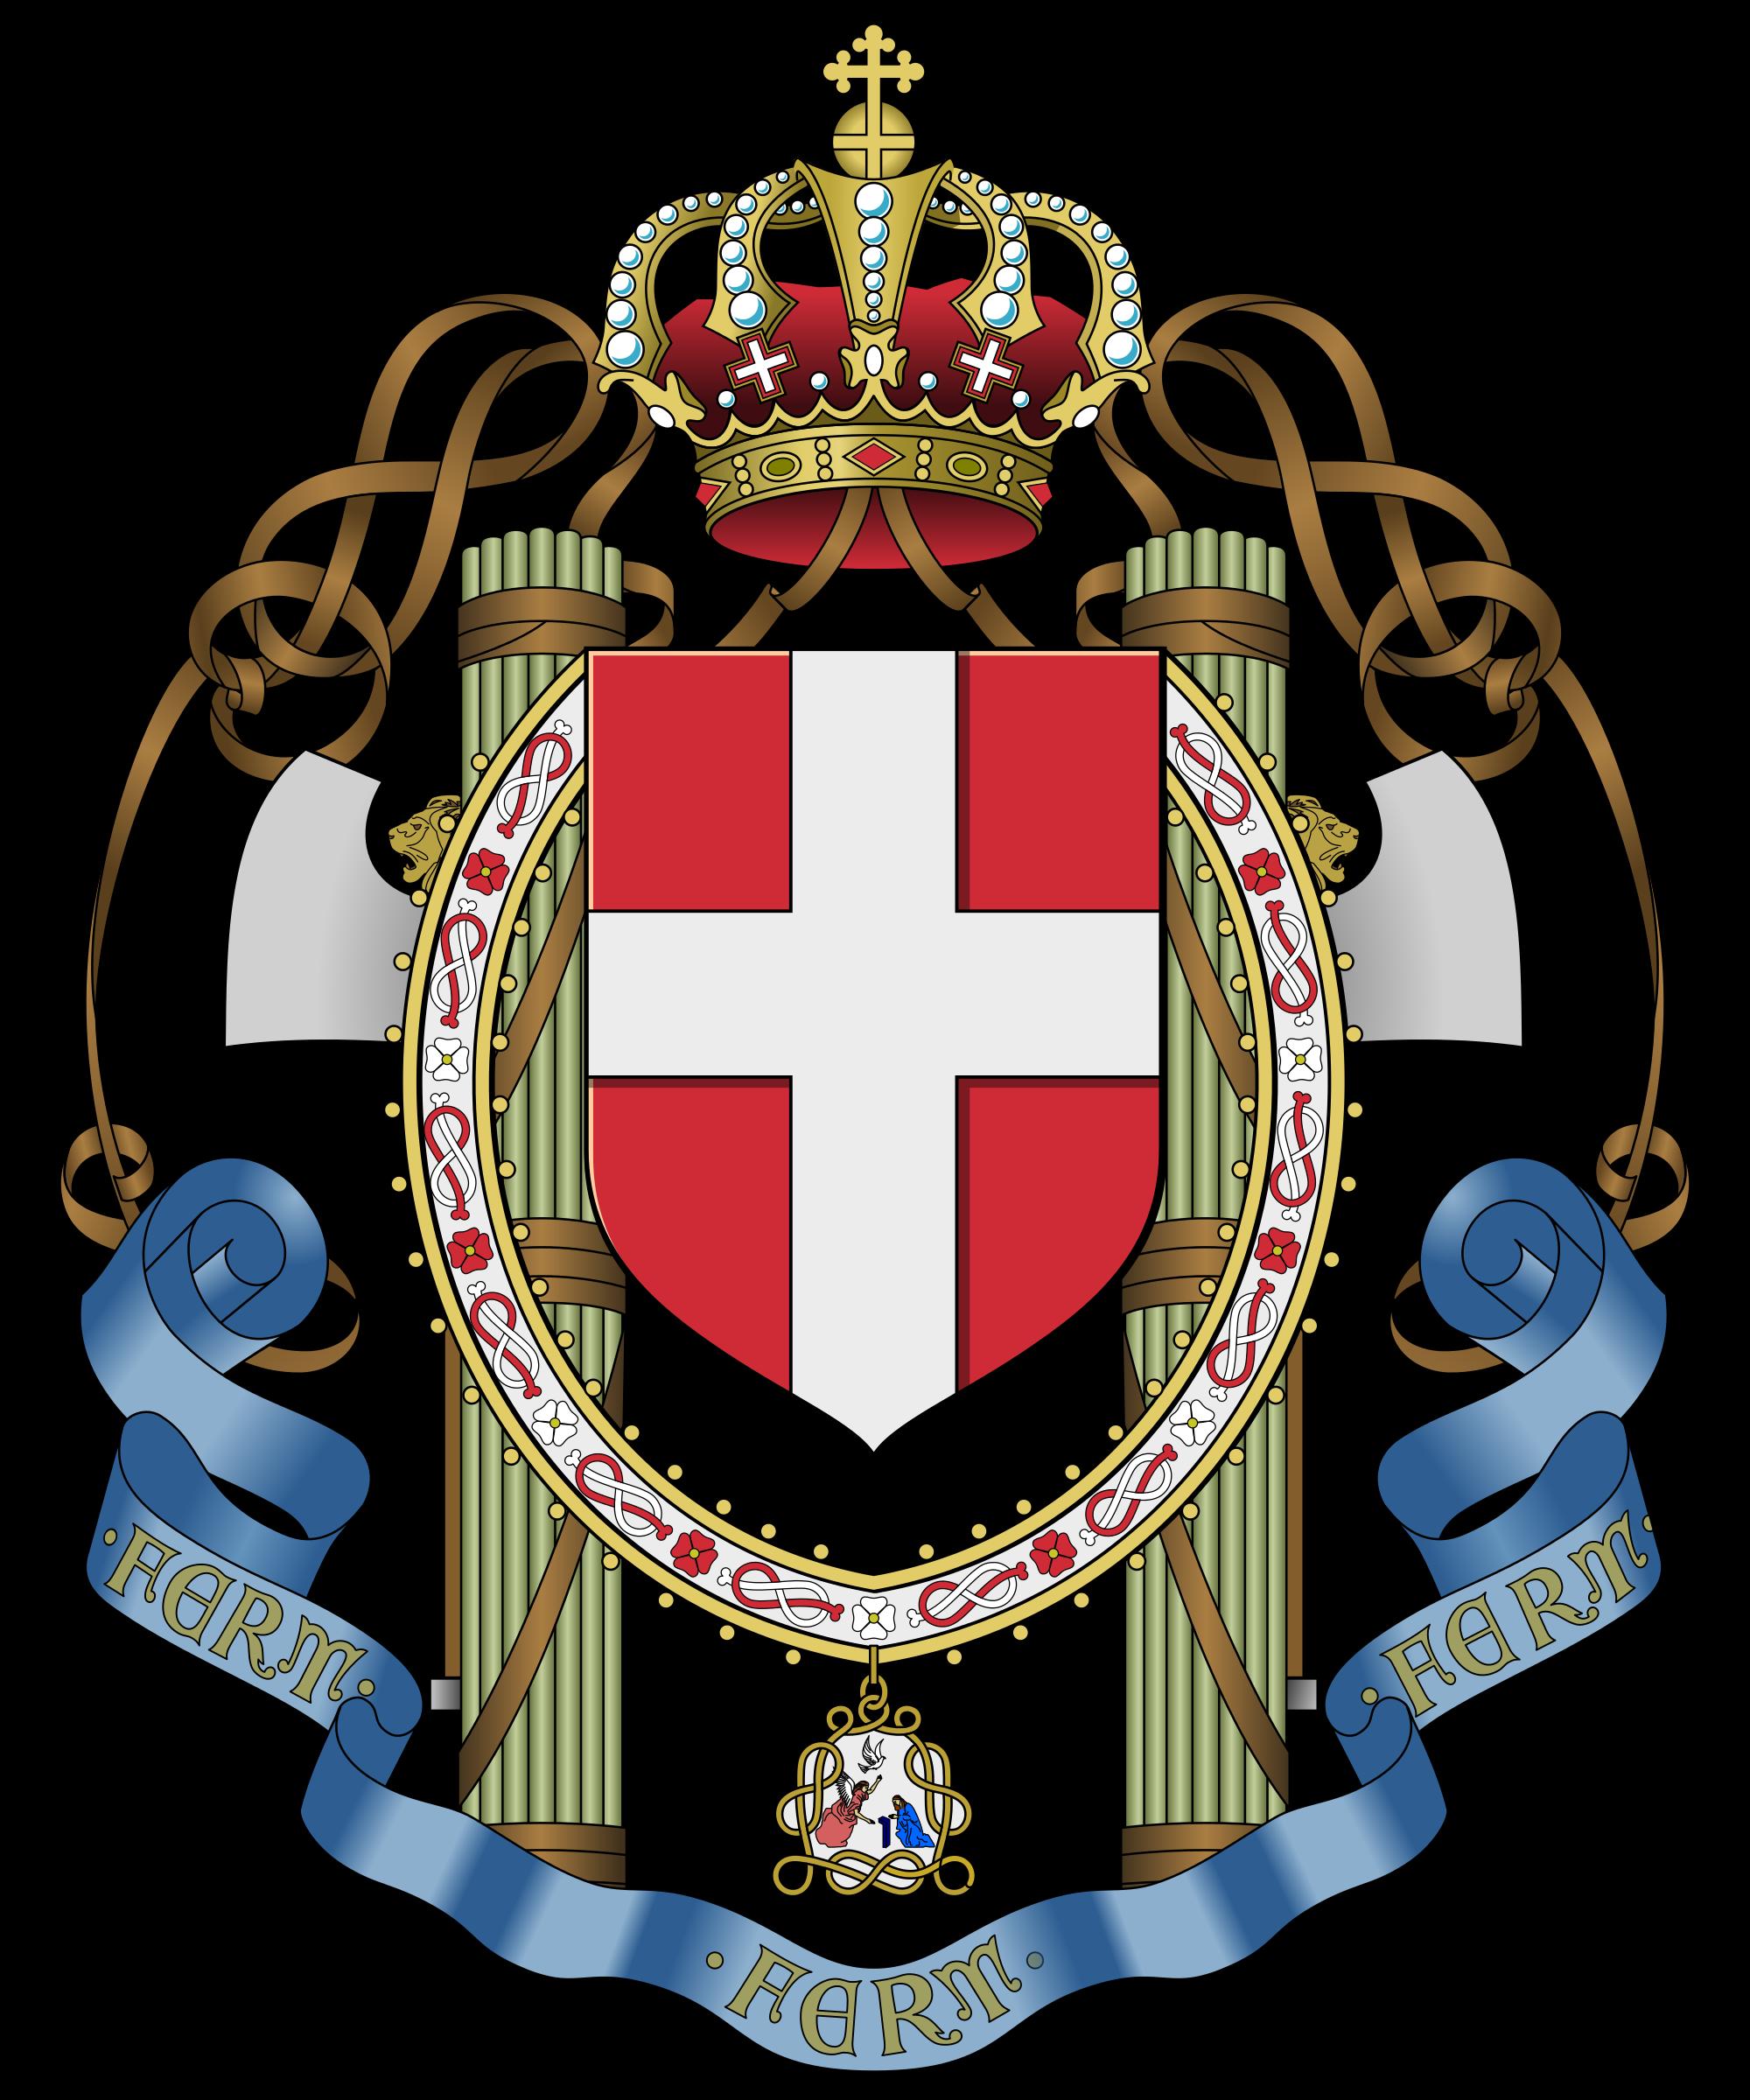 Regia aeronautica wikipedia. Italy clipart night italian